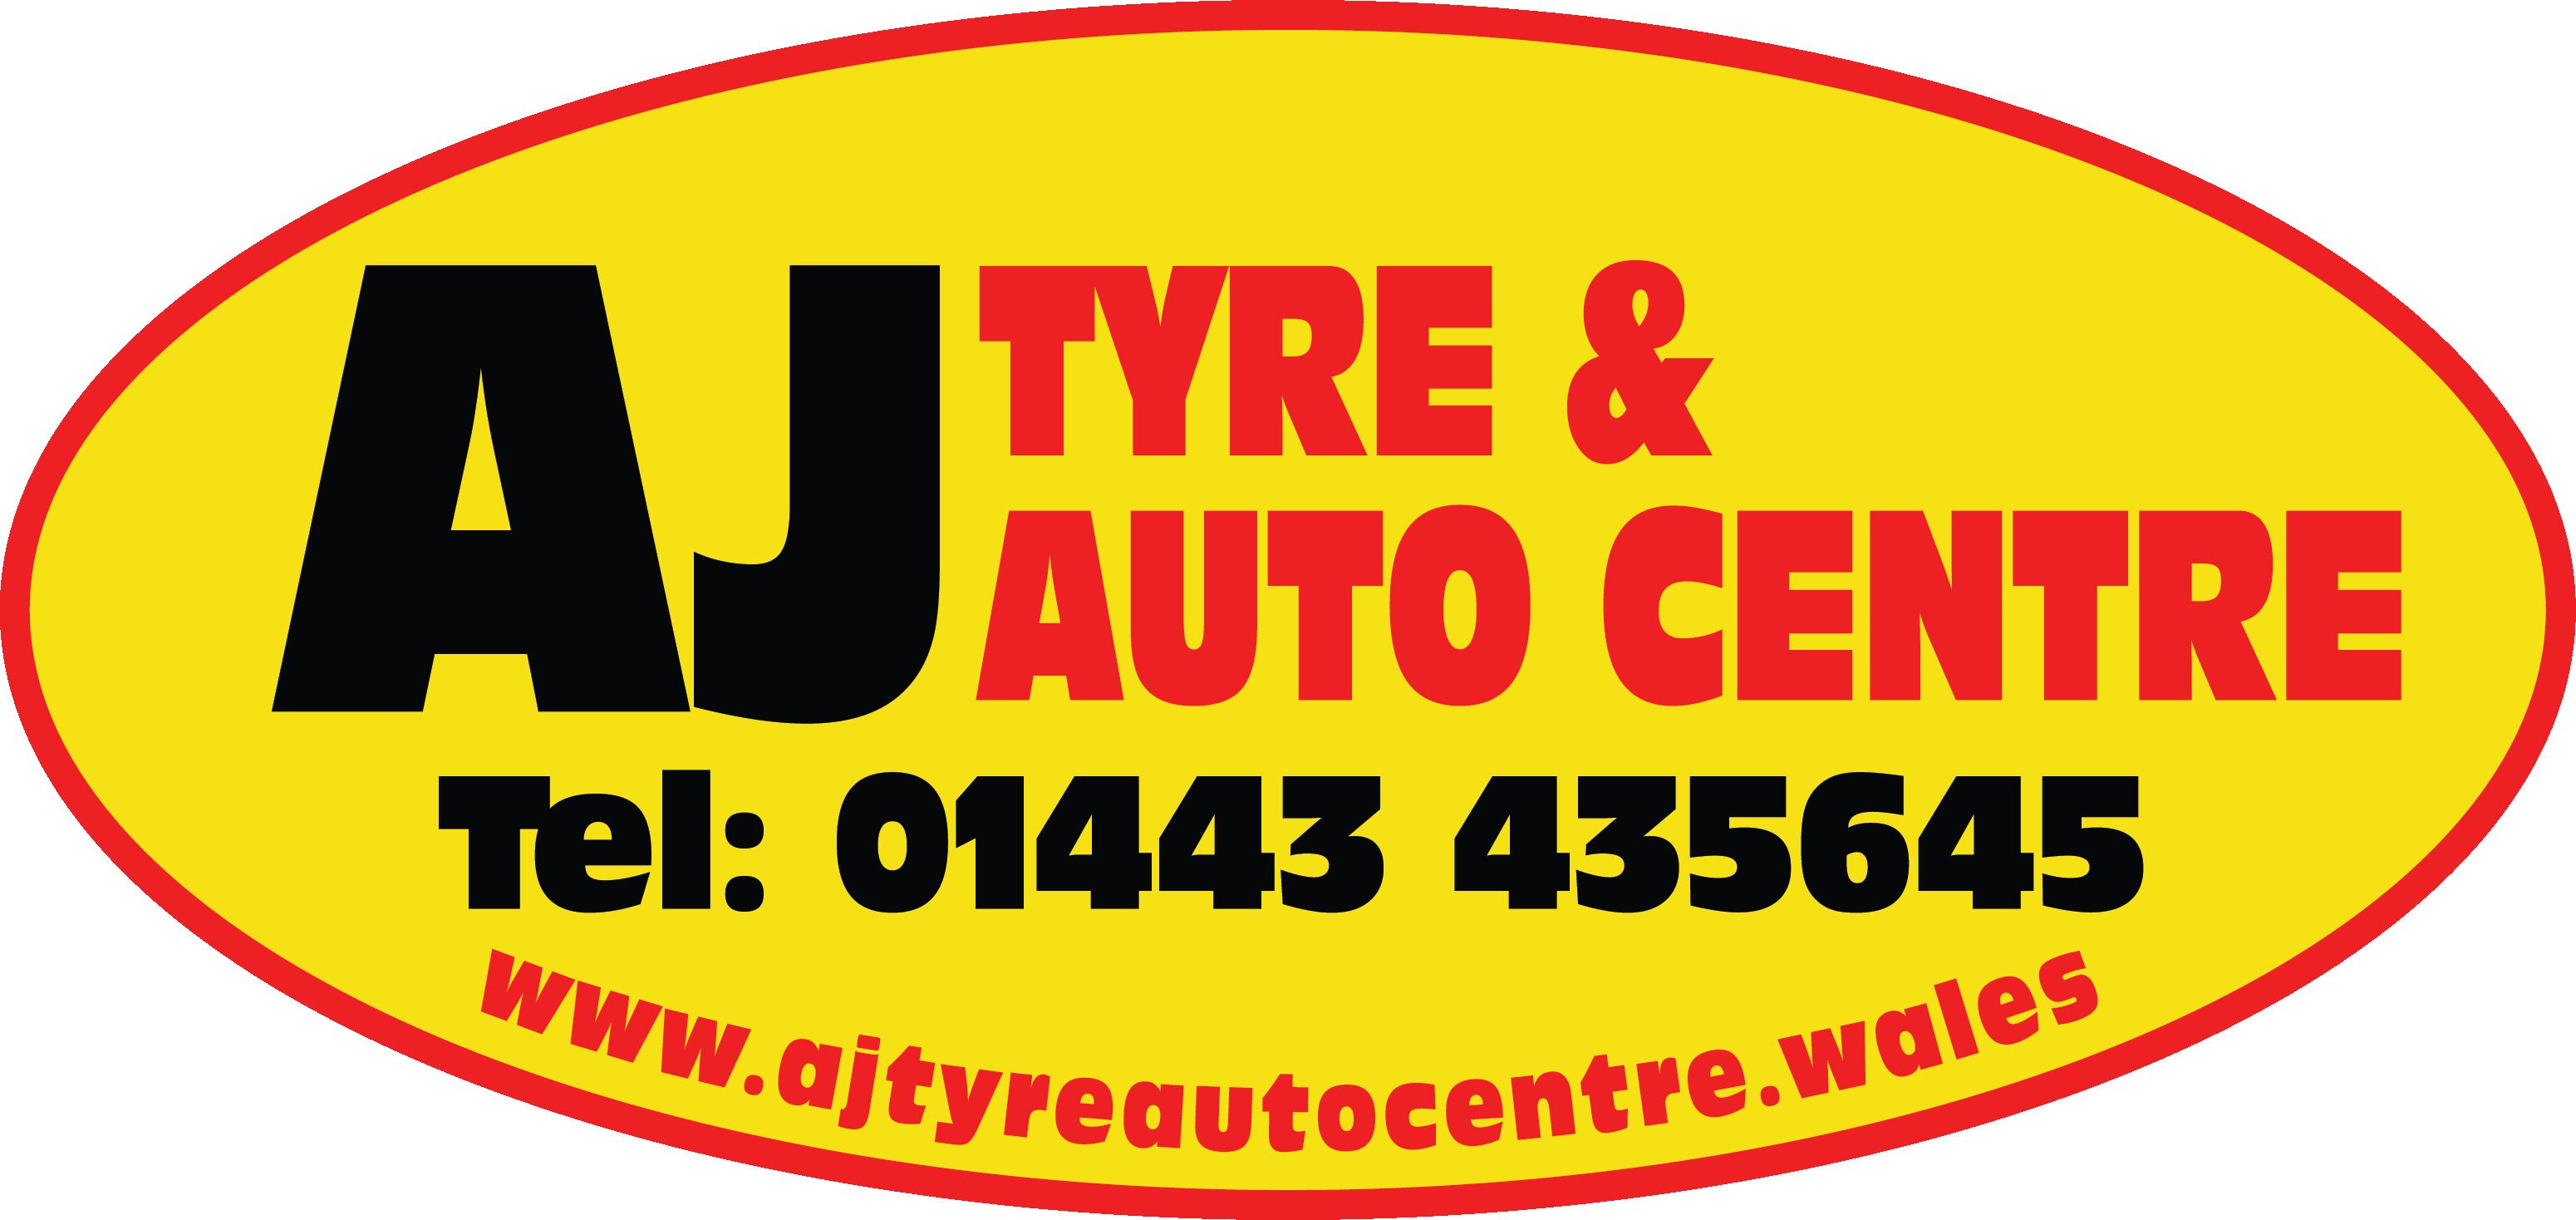 AJ Tyre & Auto Centre